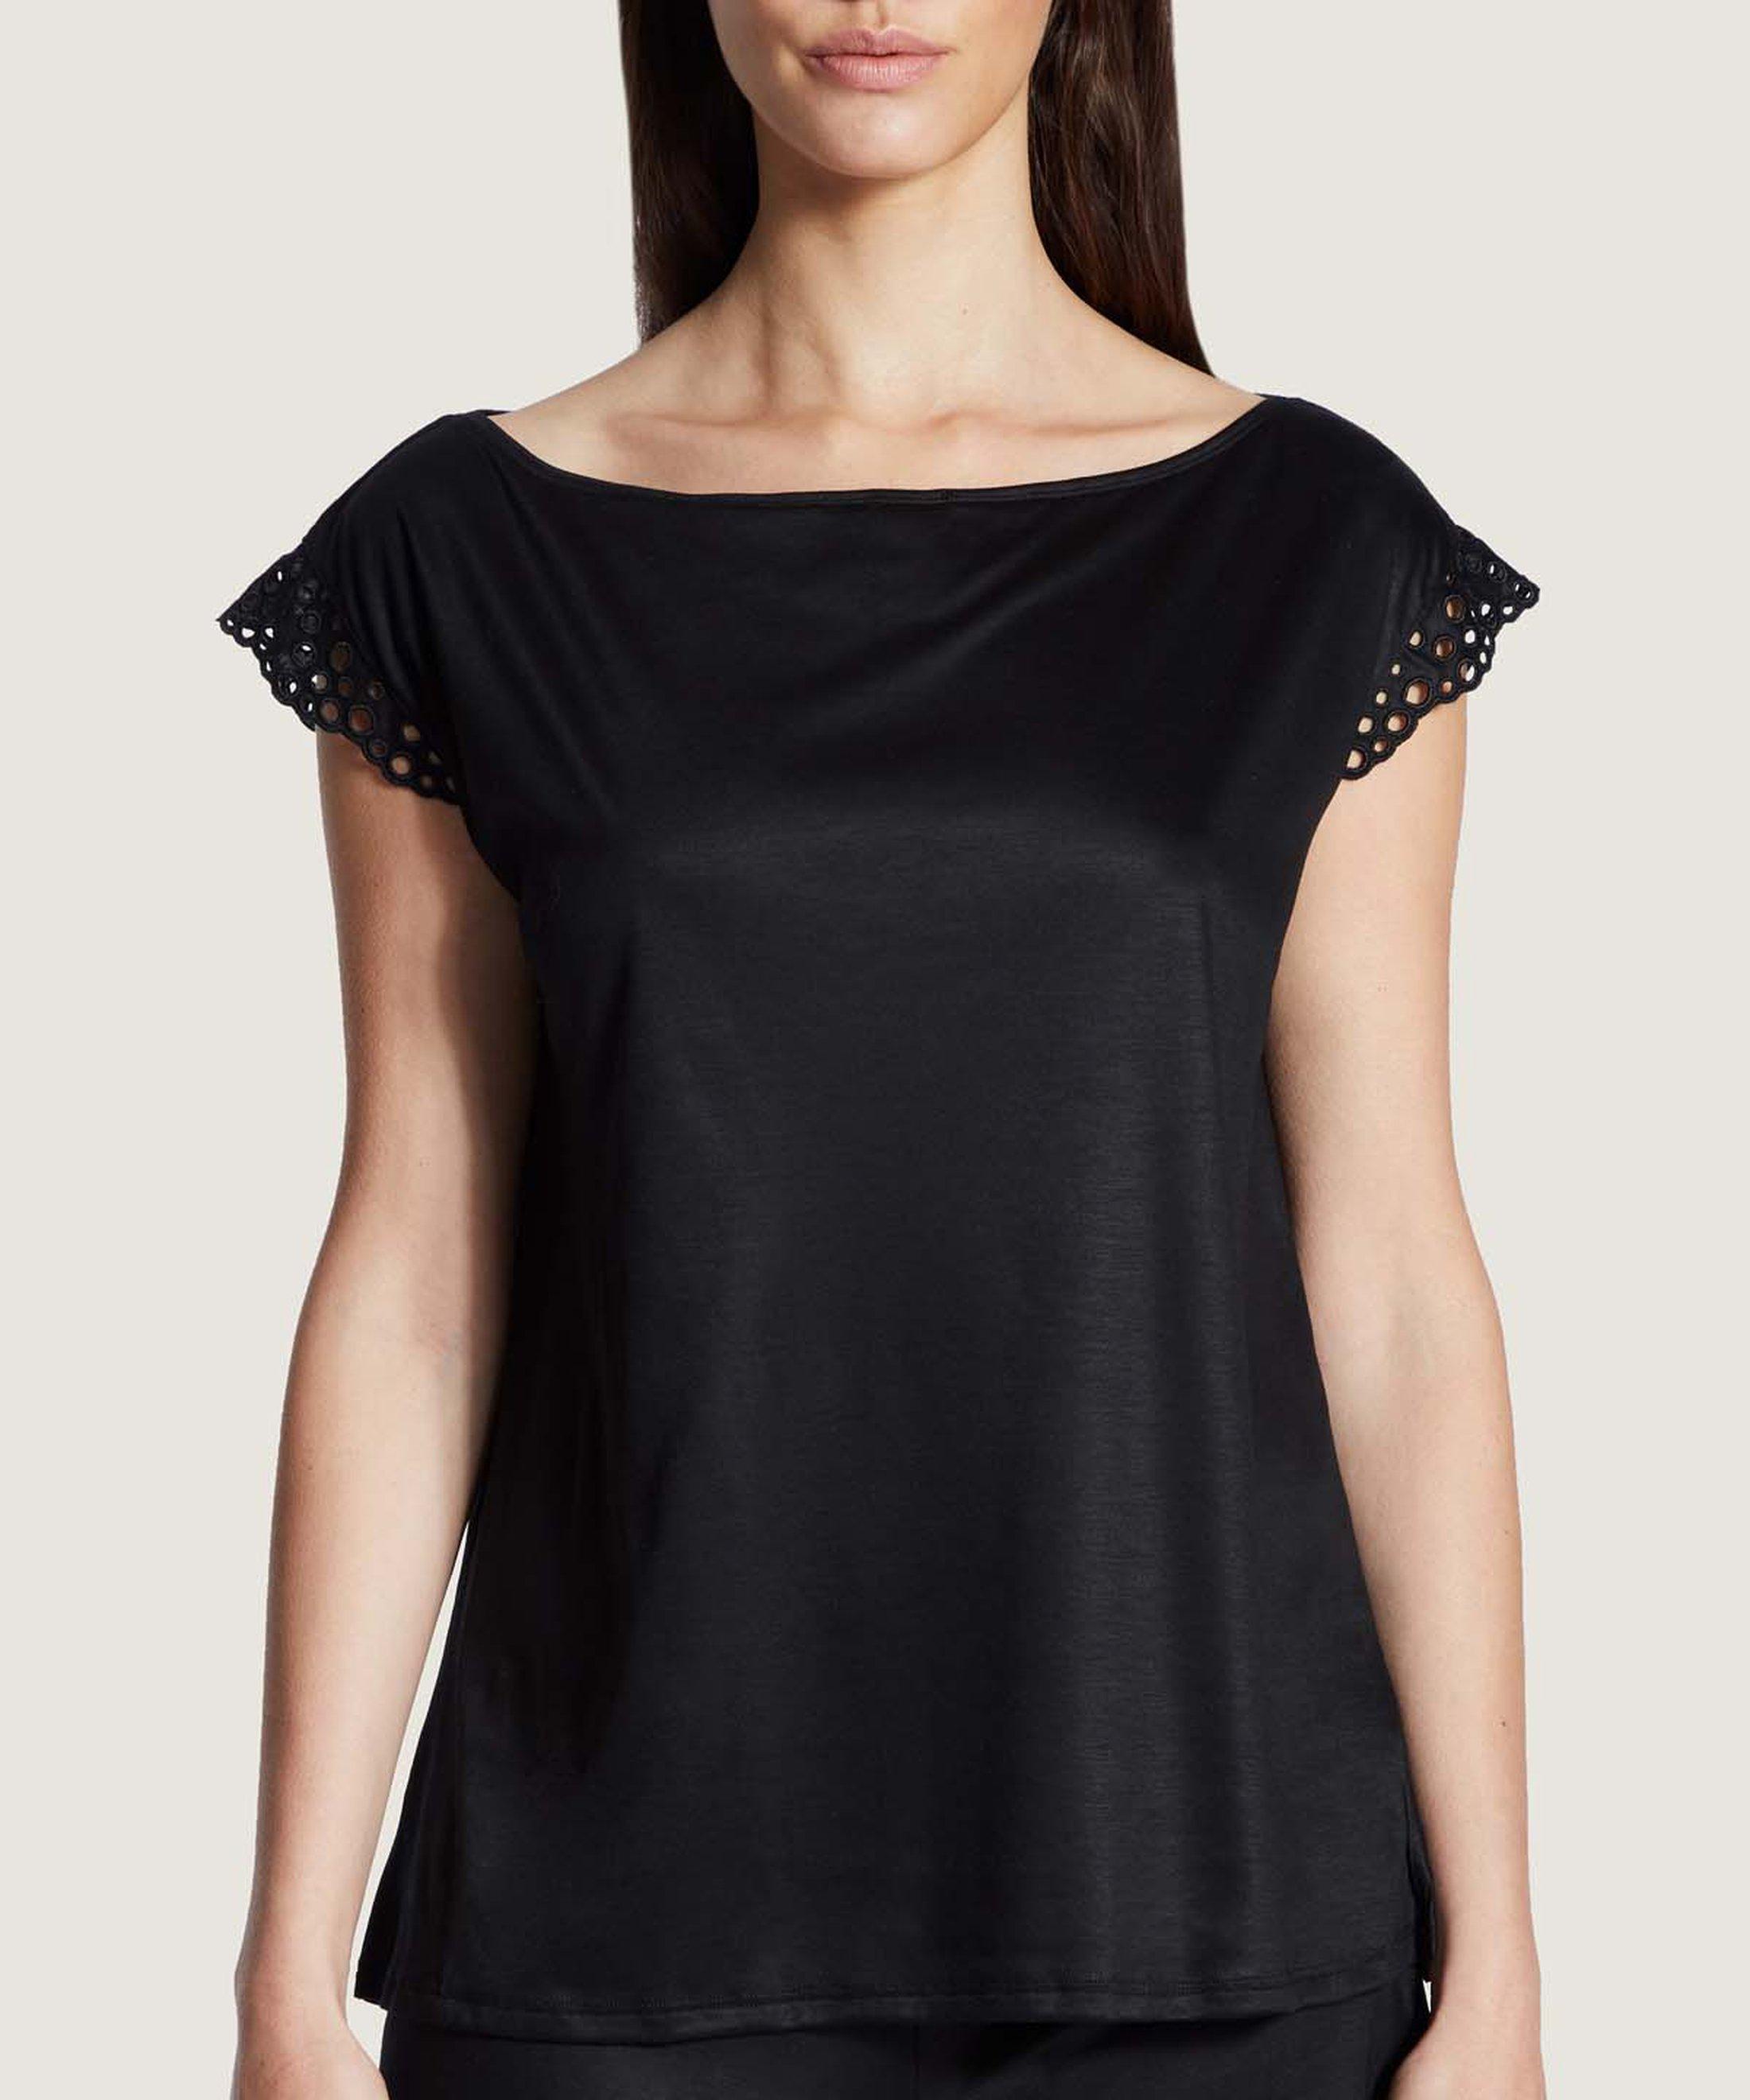 BULLE DE DOUCEUR Tencel sleeves top Black | Aubade